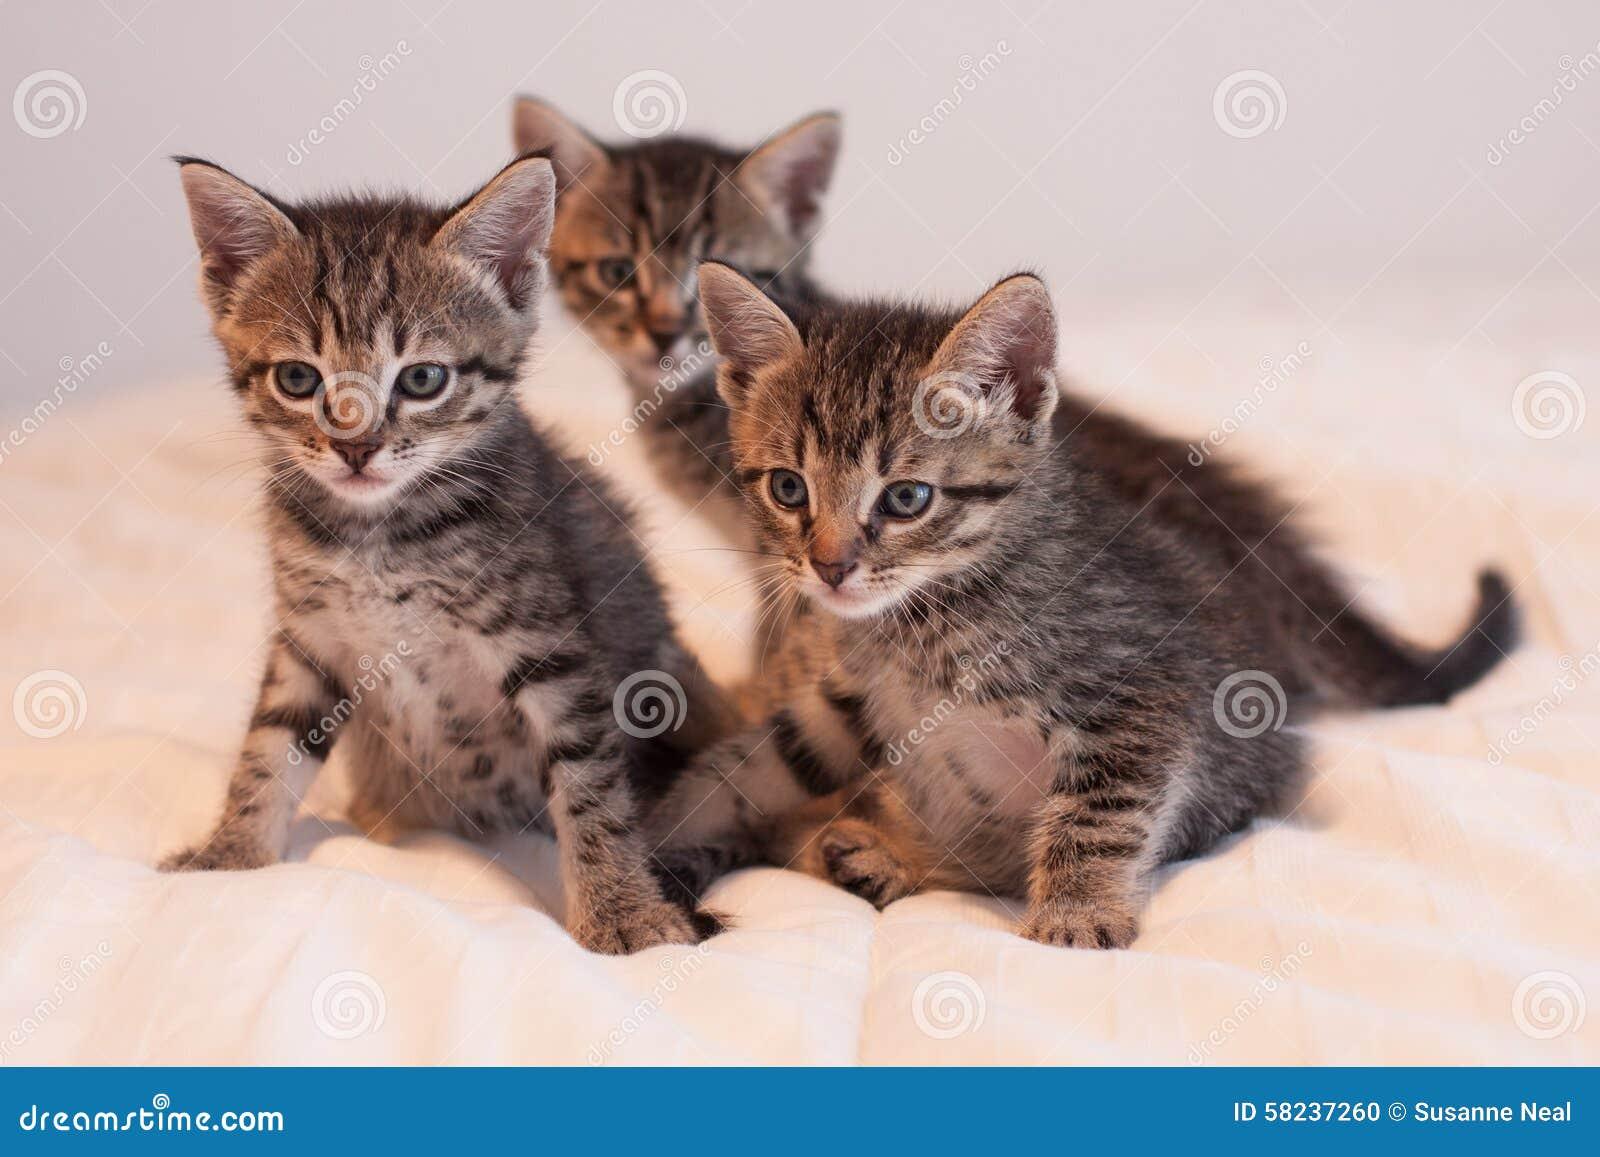 Three Cute Tabby Kittens Soft f white forter Stock